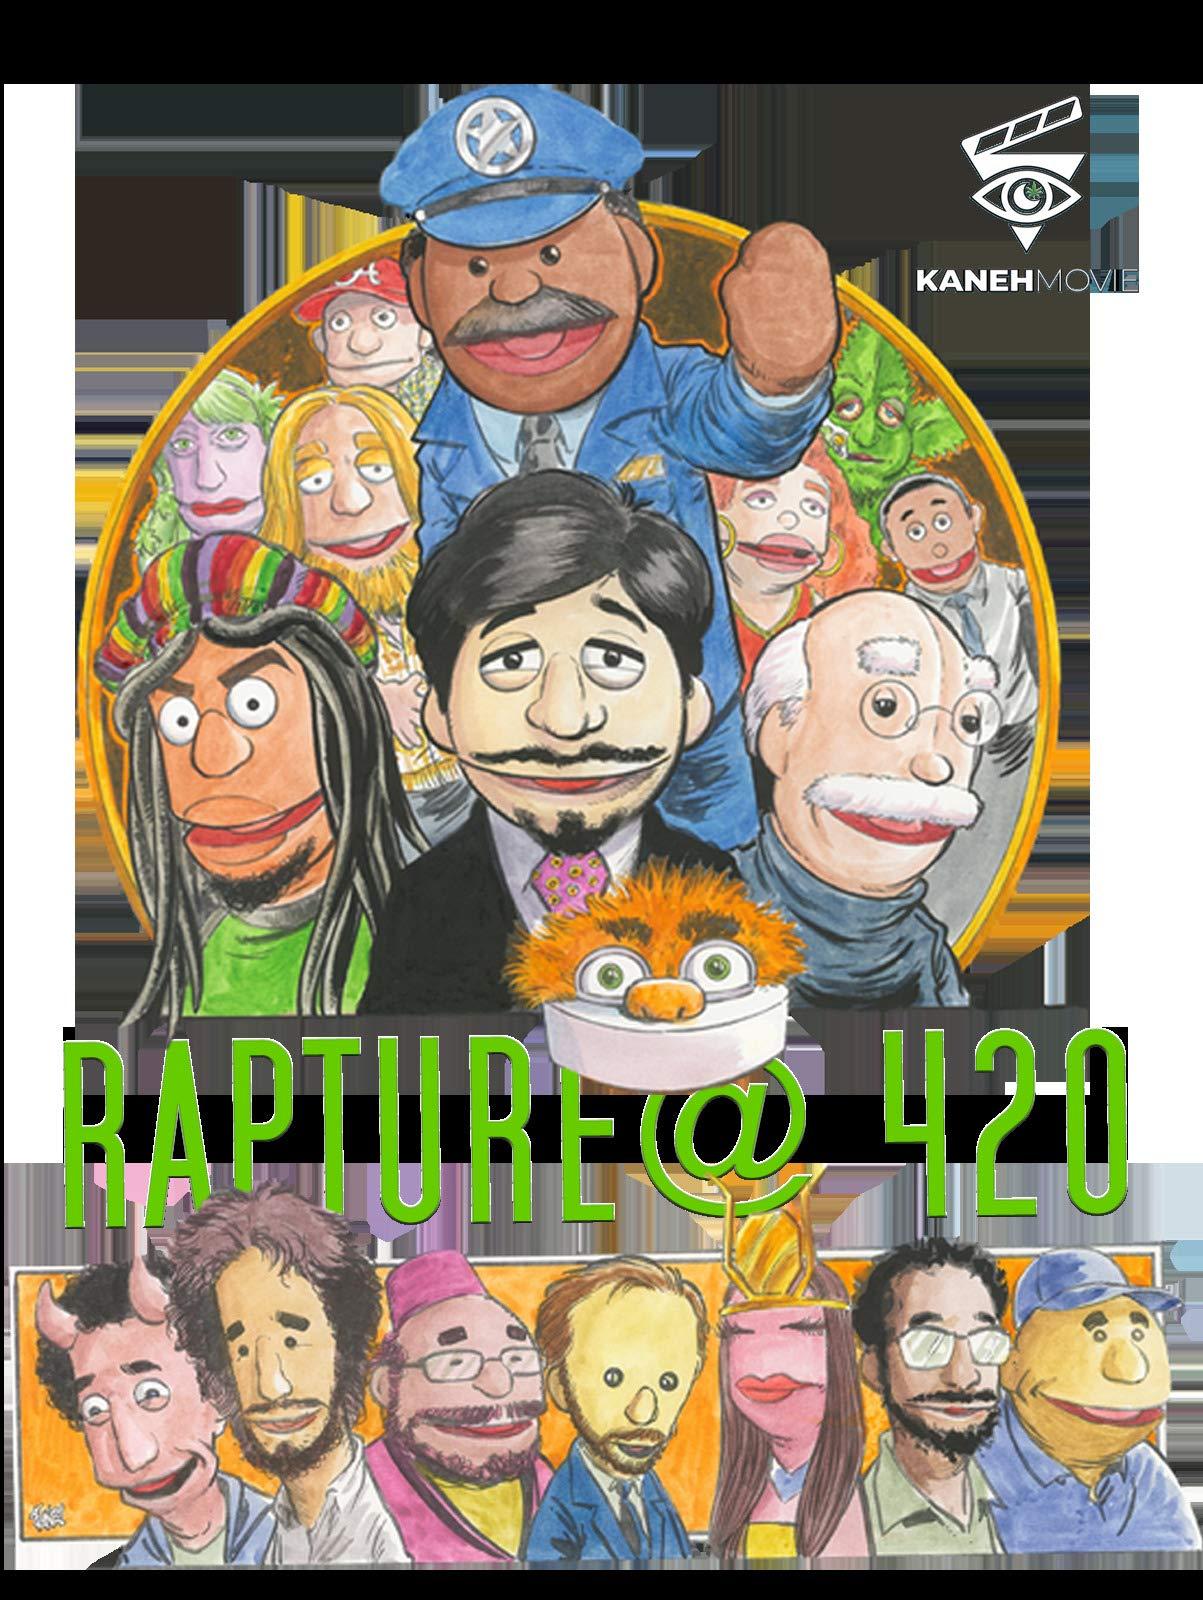 Kaneh Movie: Rapture@420